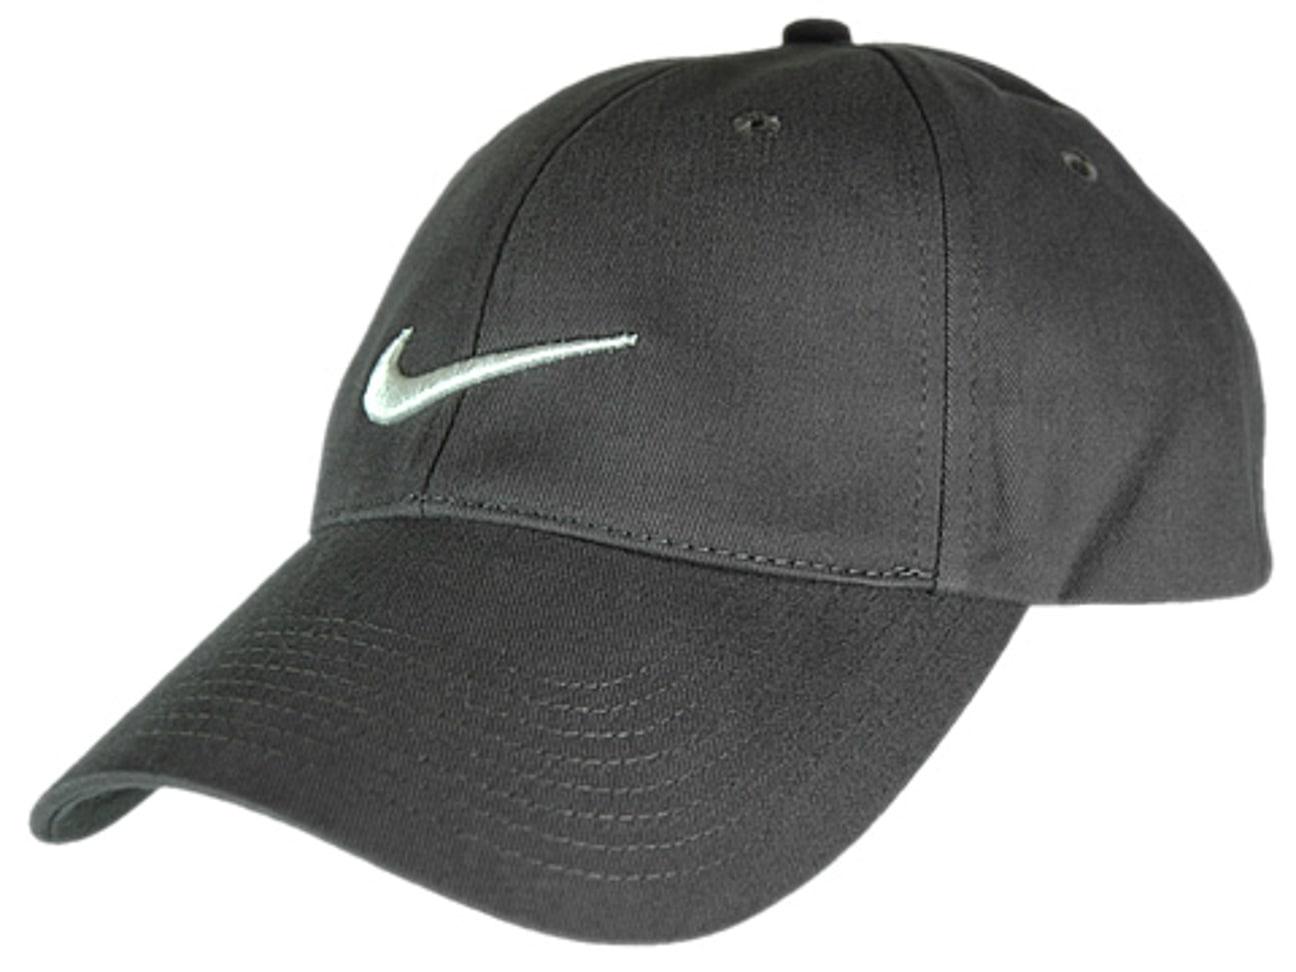 03952a9e320c5 ... Structured Swoosh Cap by Nike - grey 1 ...